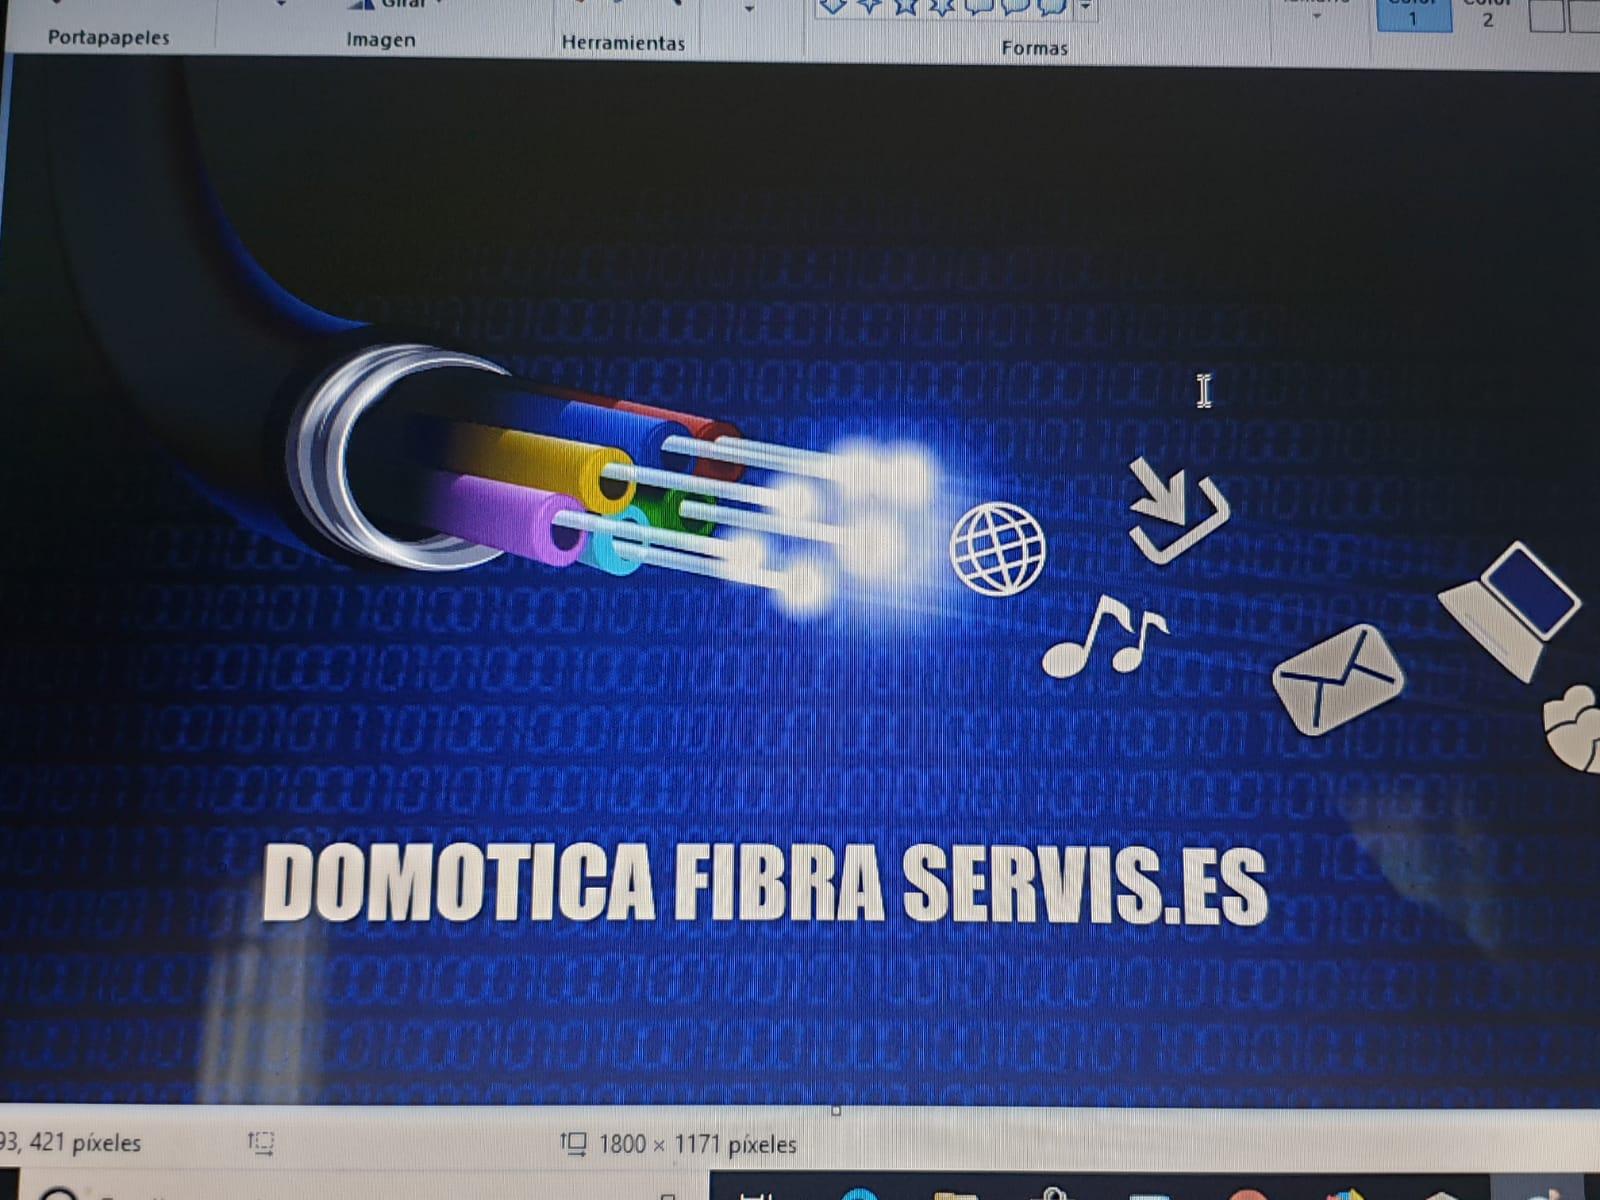 Domoticafribraservis@.es